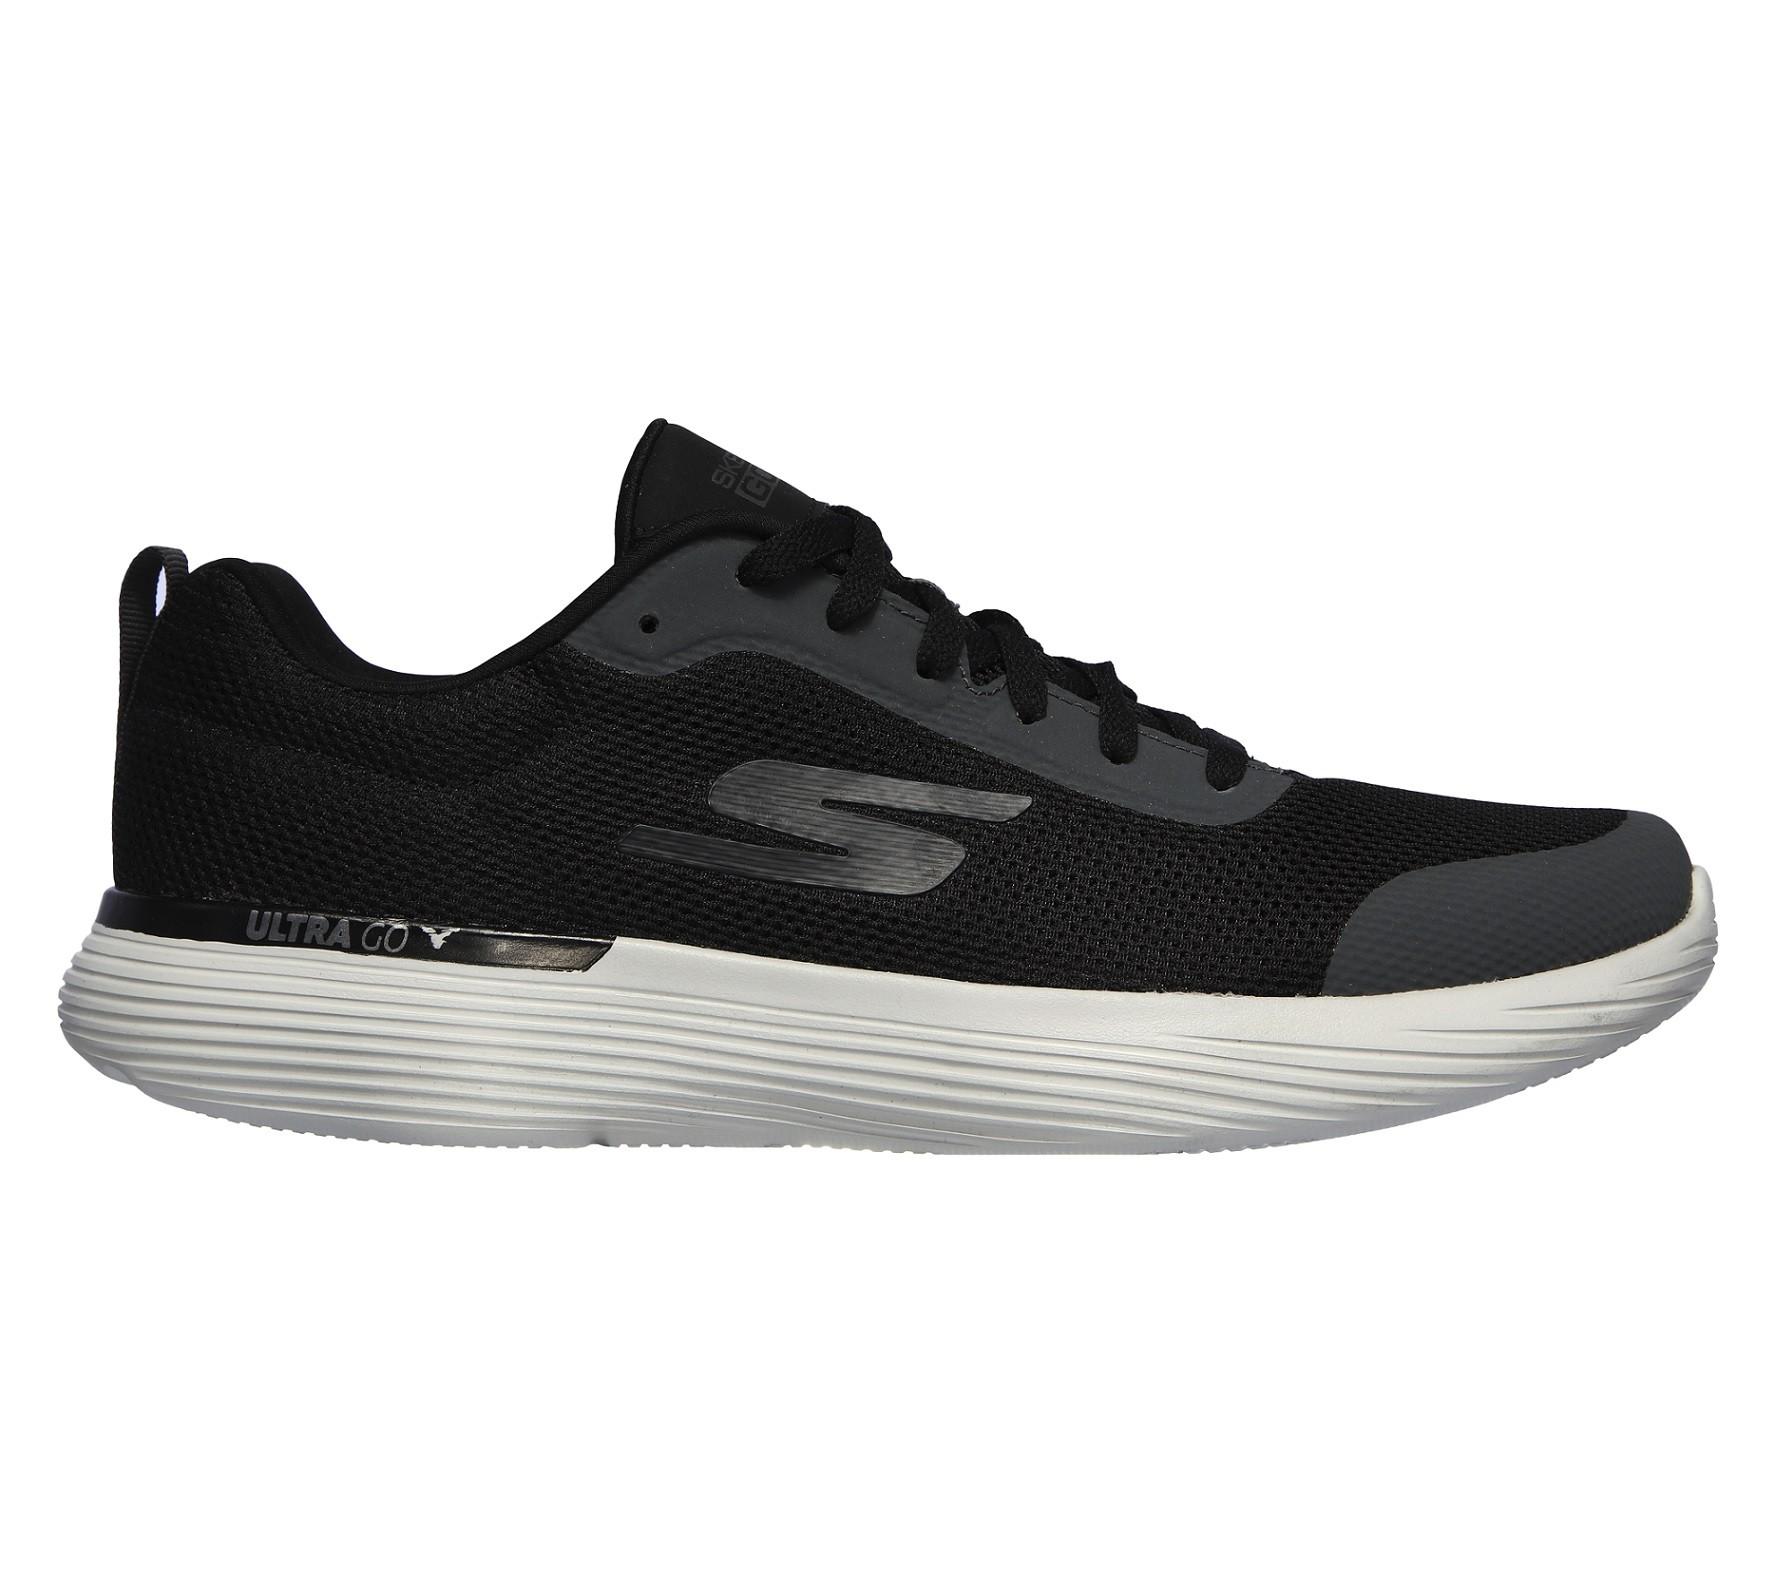 Tênis Go Run 400 V2 - Ômega Masculino Skechers